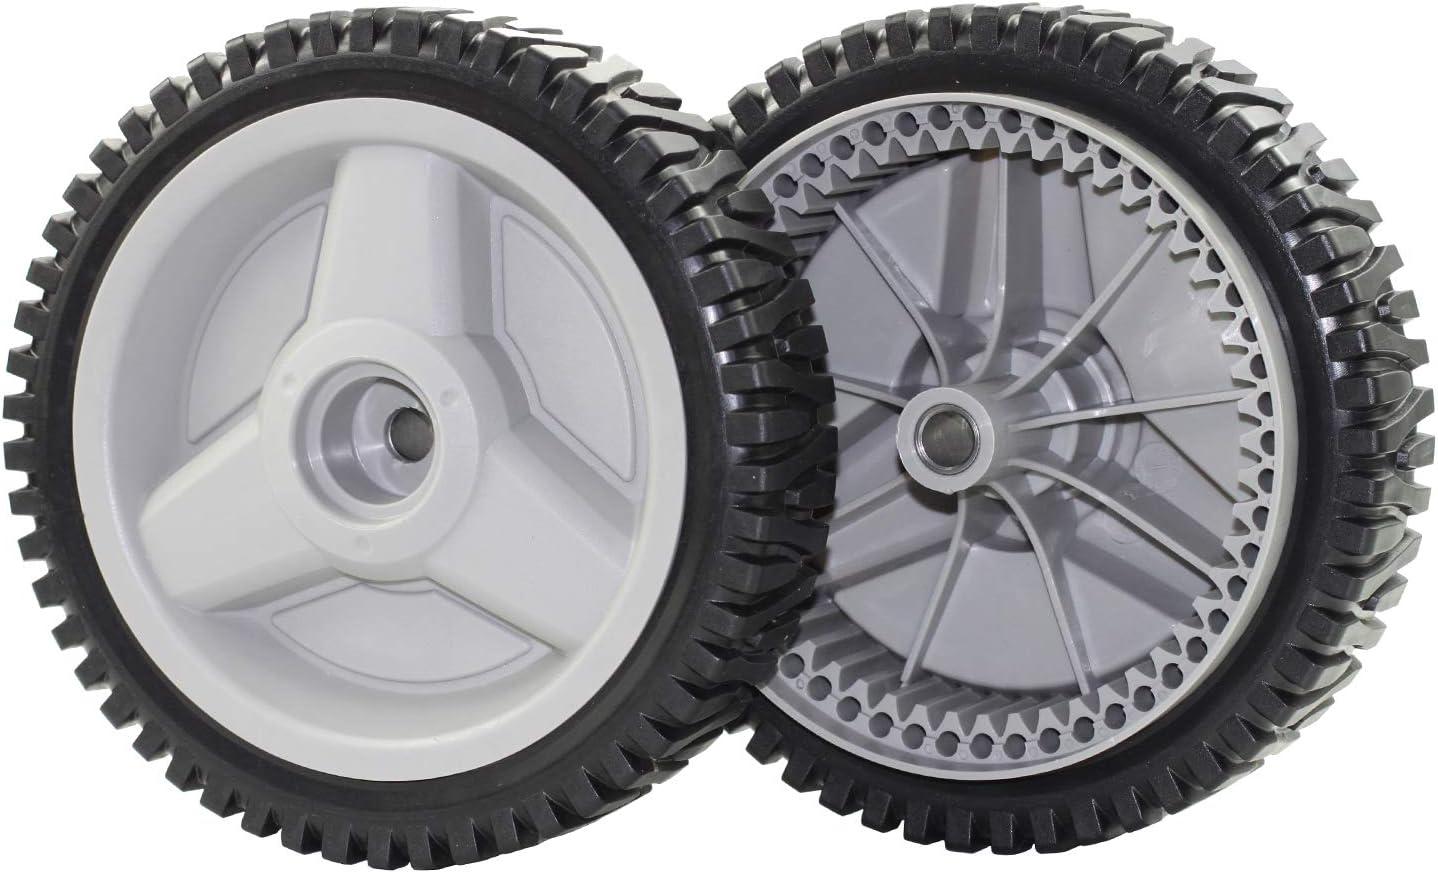 Husqvarna 532401274 Drive Wheel Replacement XT722 FE